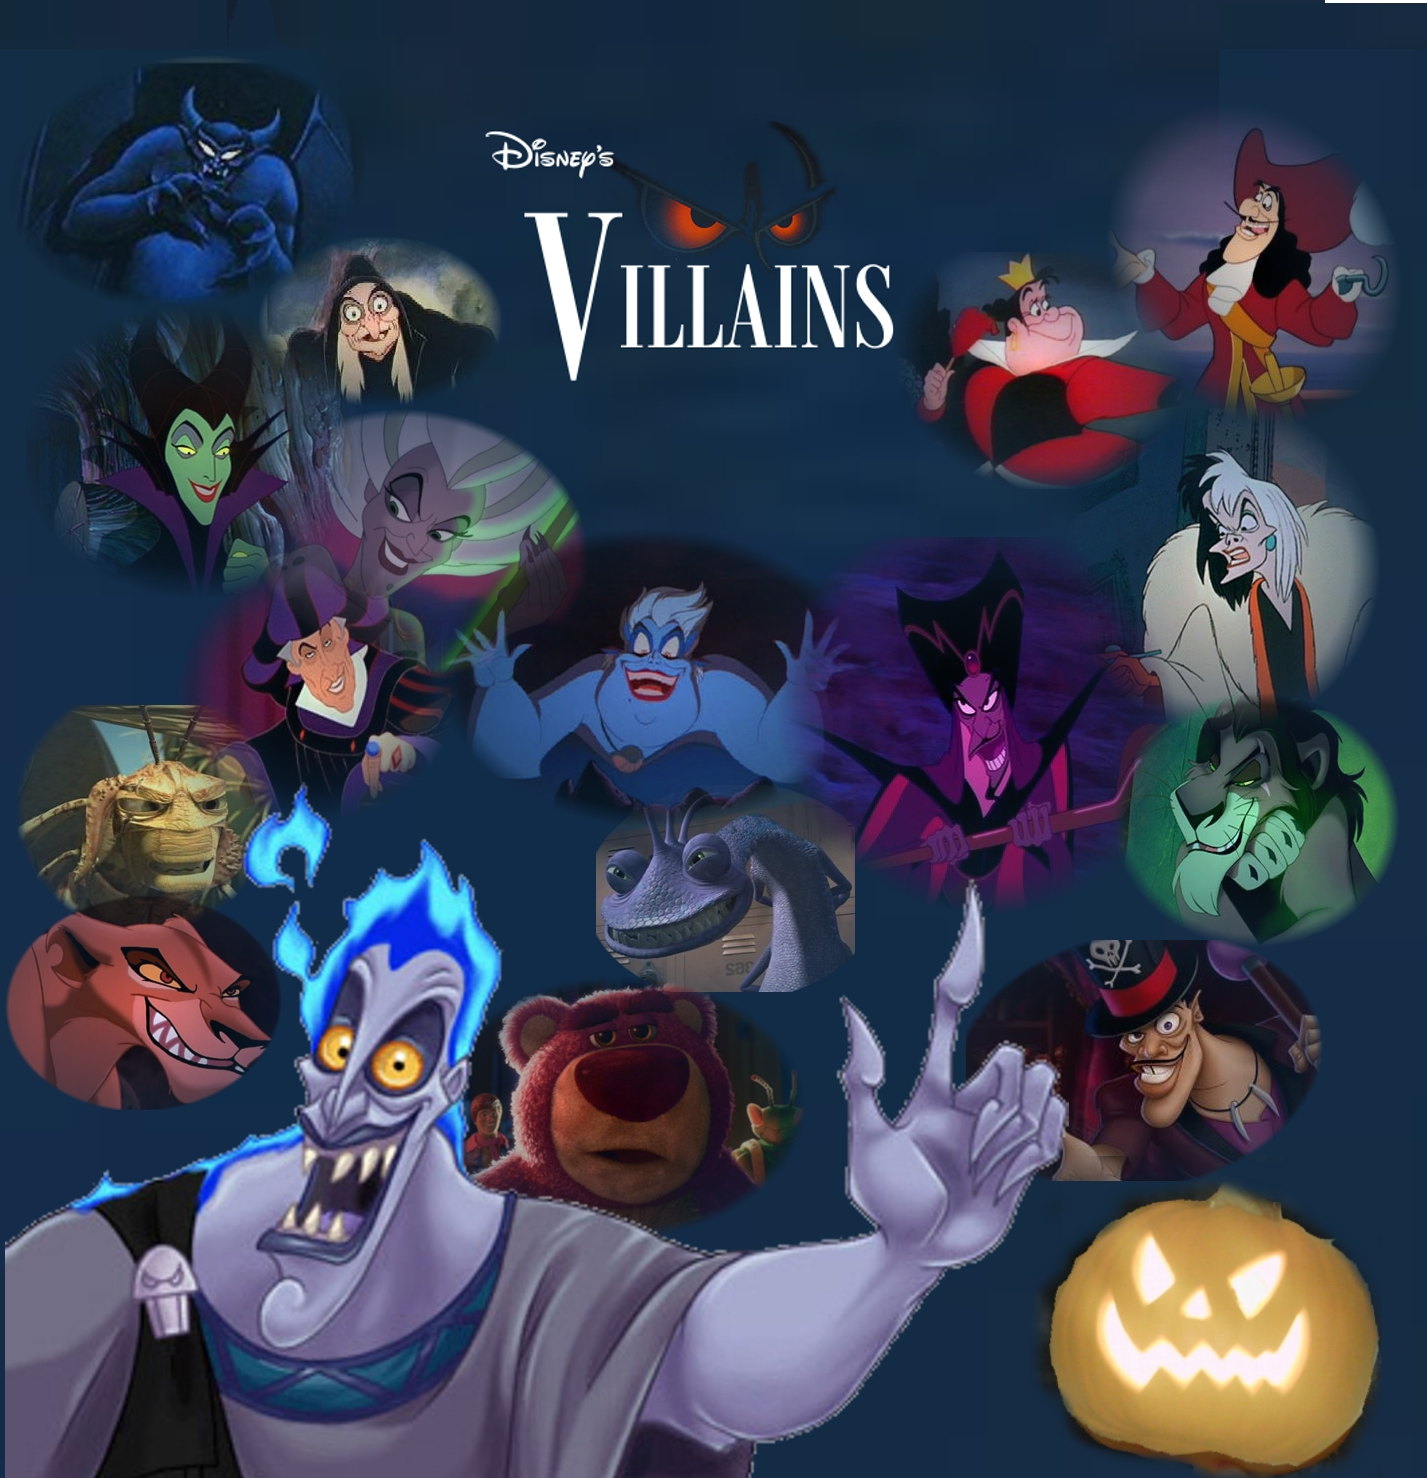 Disney Villains from Disney